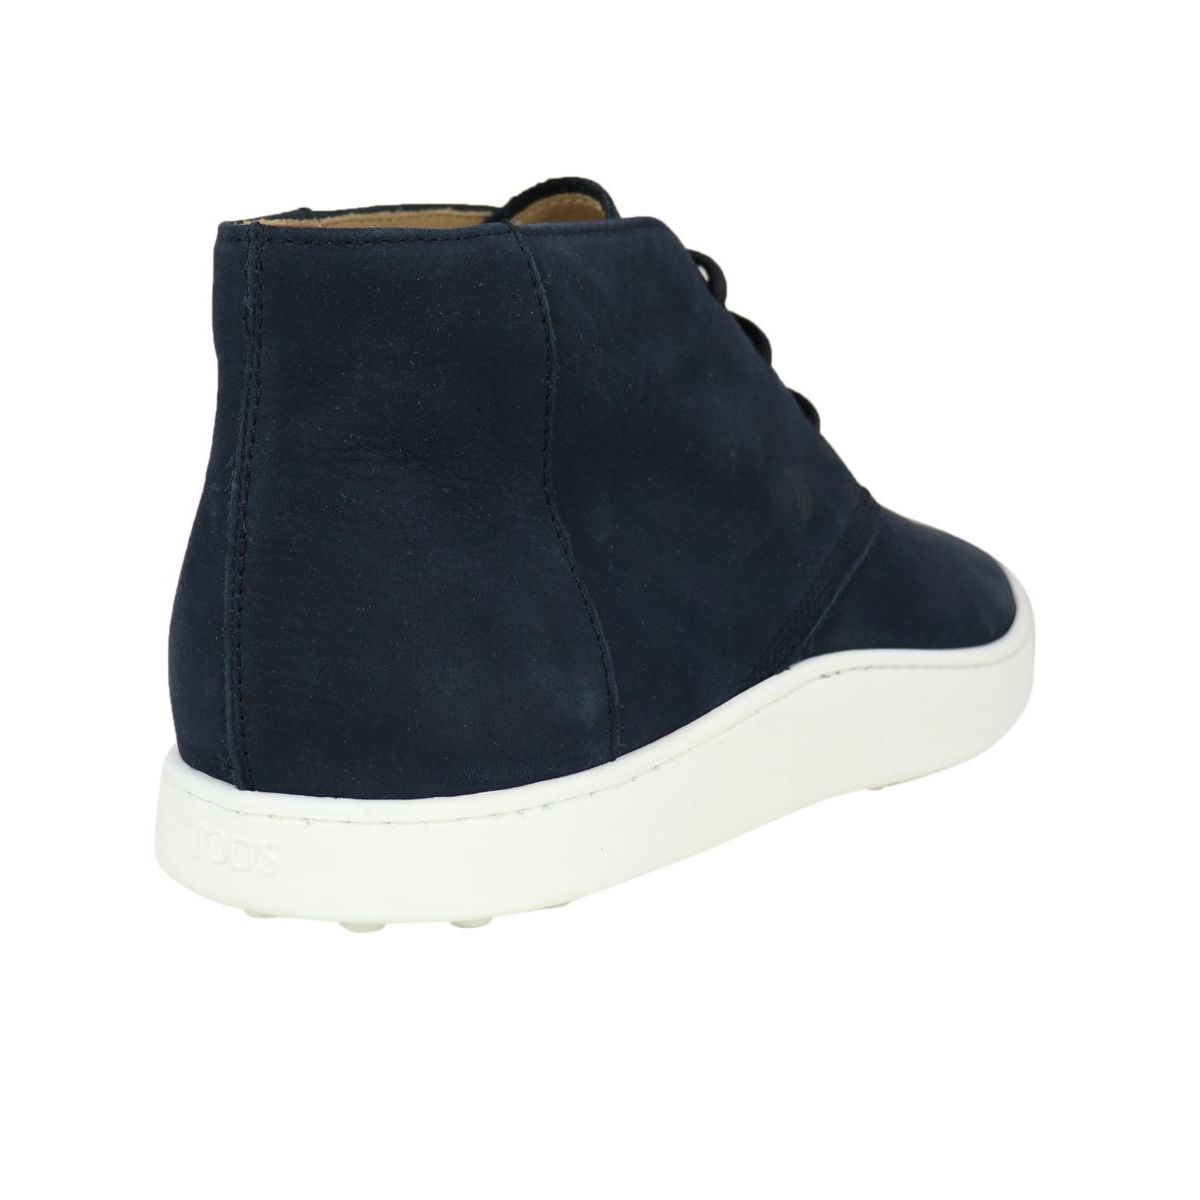 Ankle boot FONDO 52B CASSETTA Blue Tod's